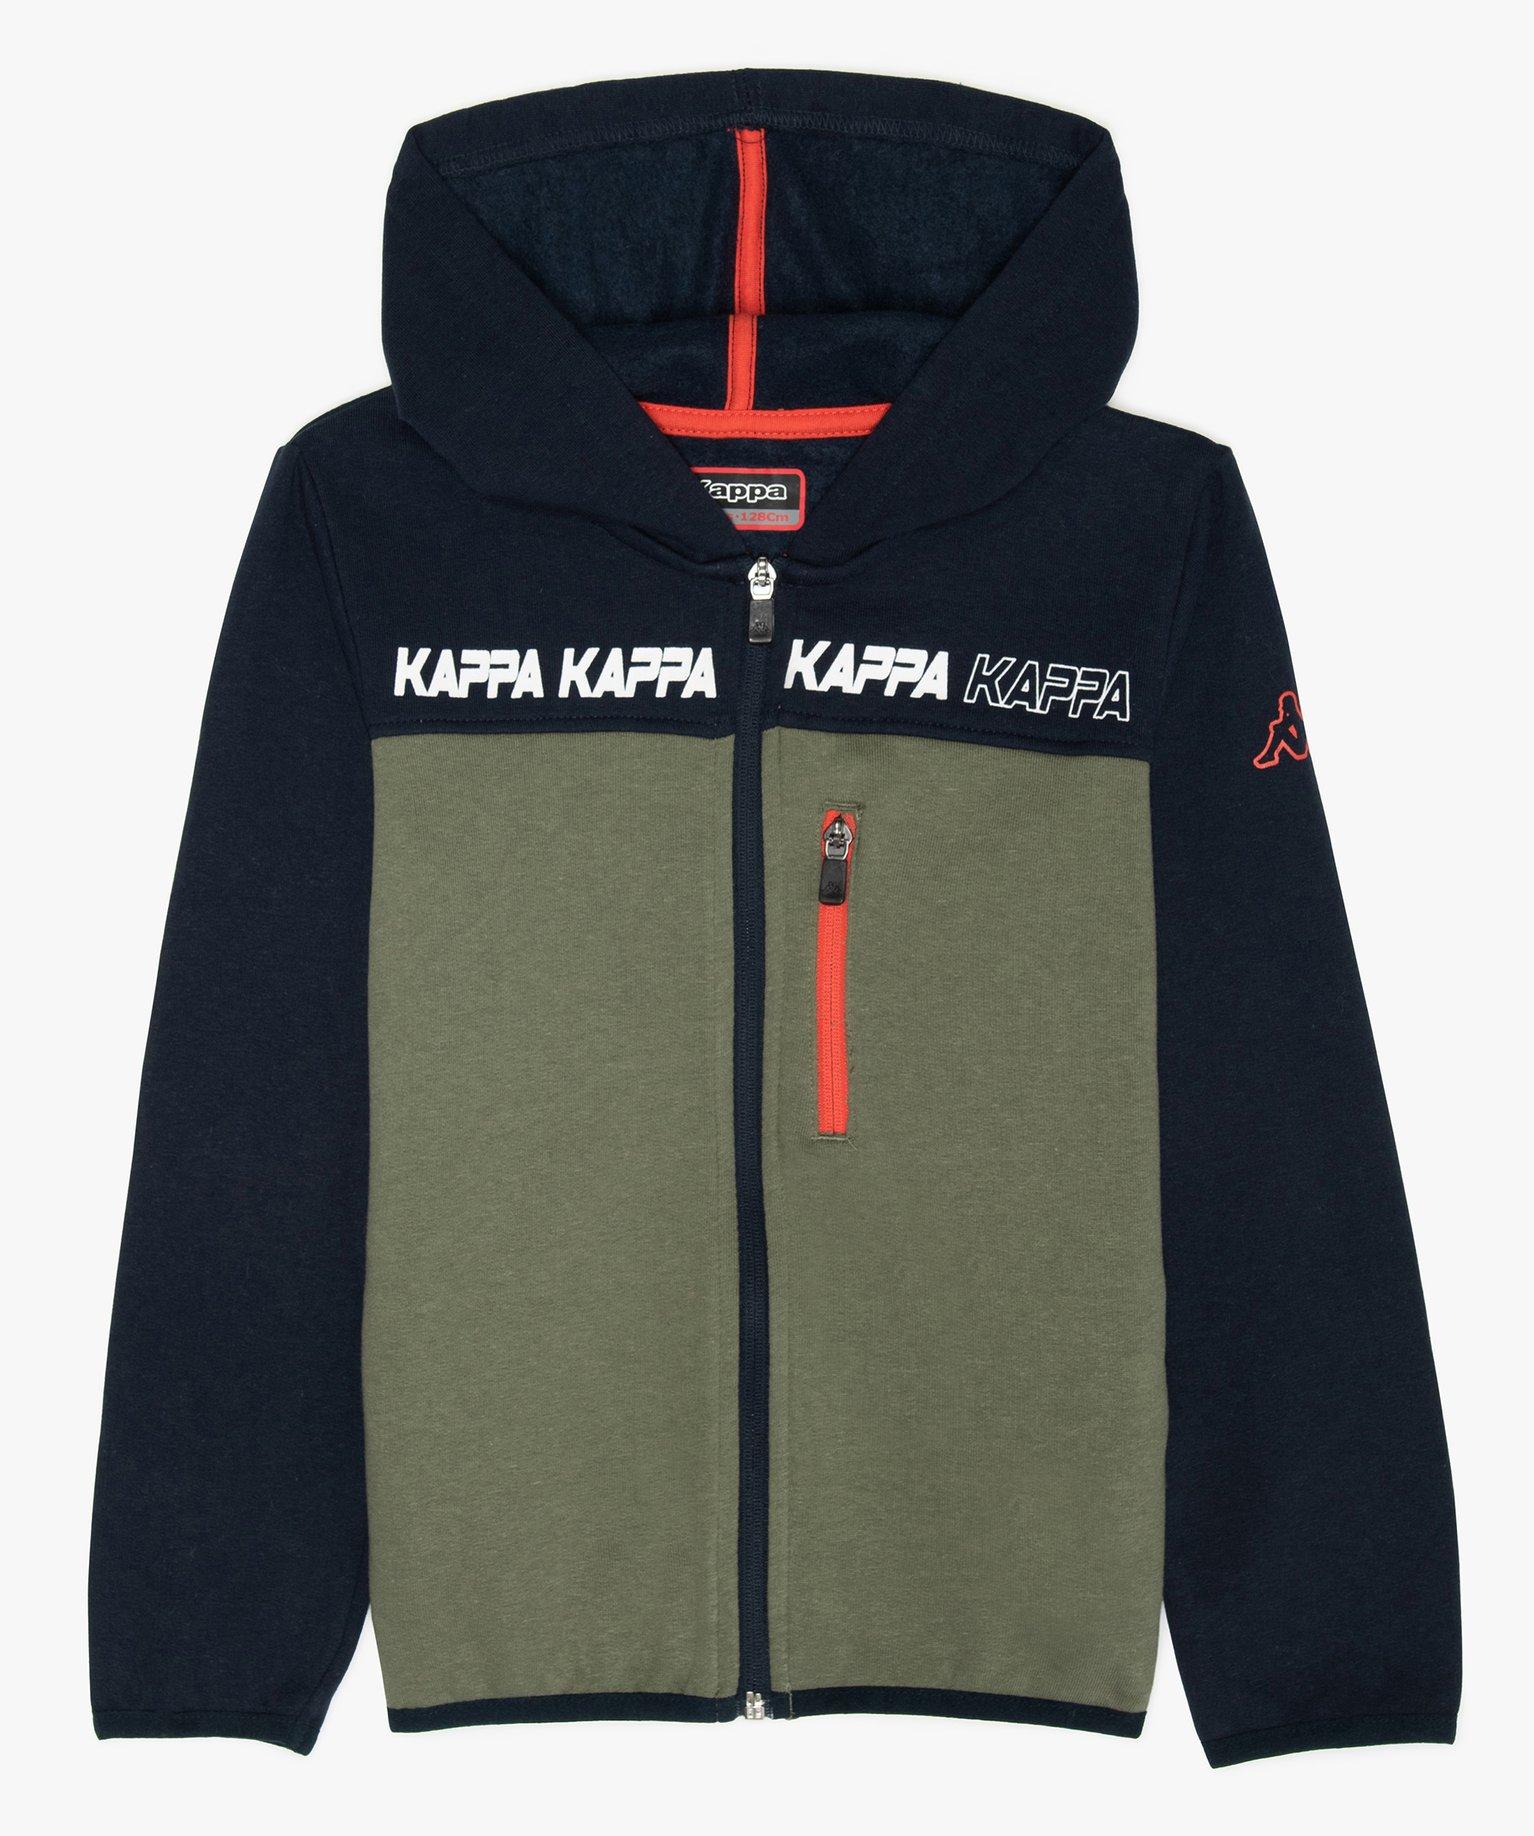 Sweat garçon chaud à zip et capuche – Kappa